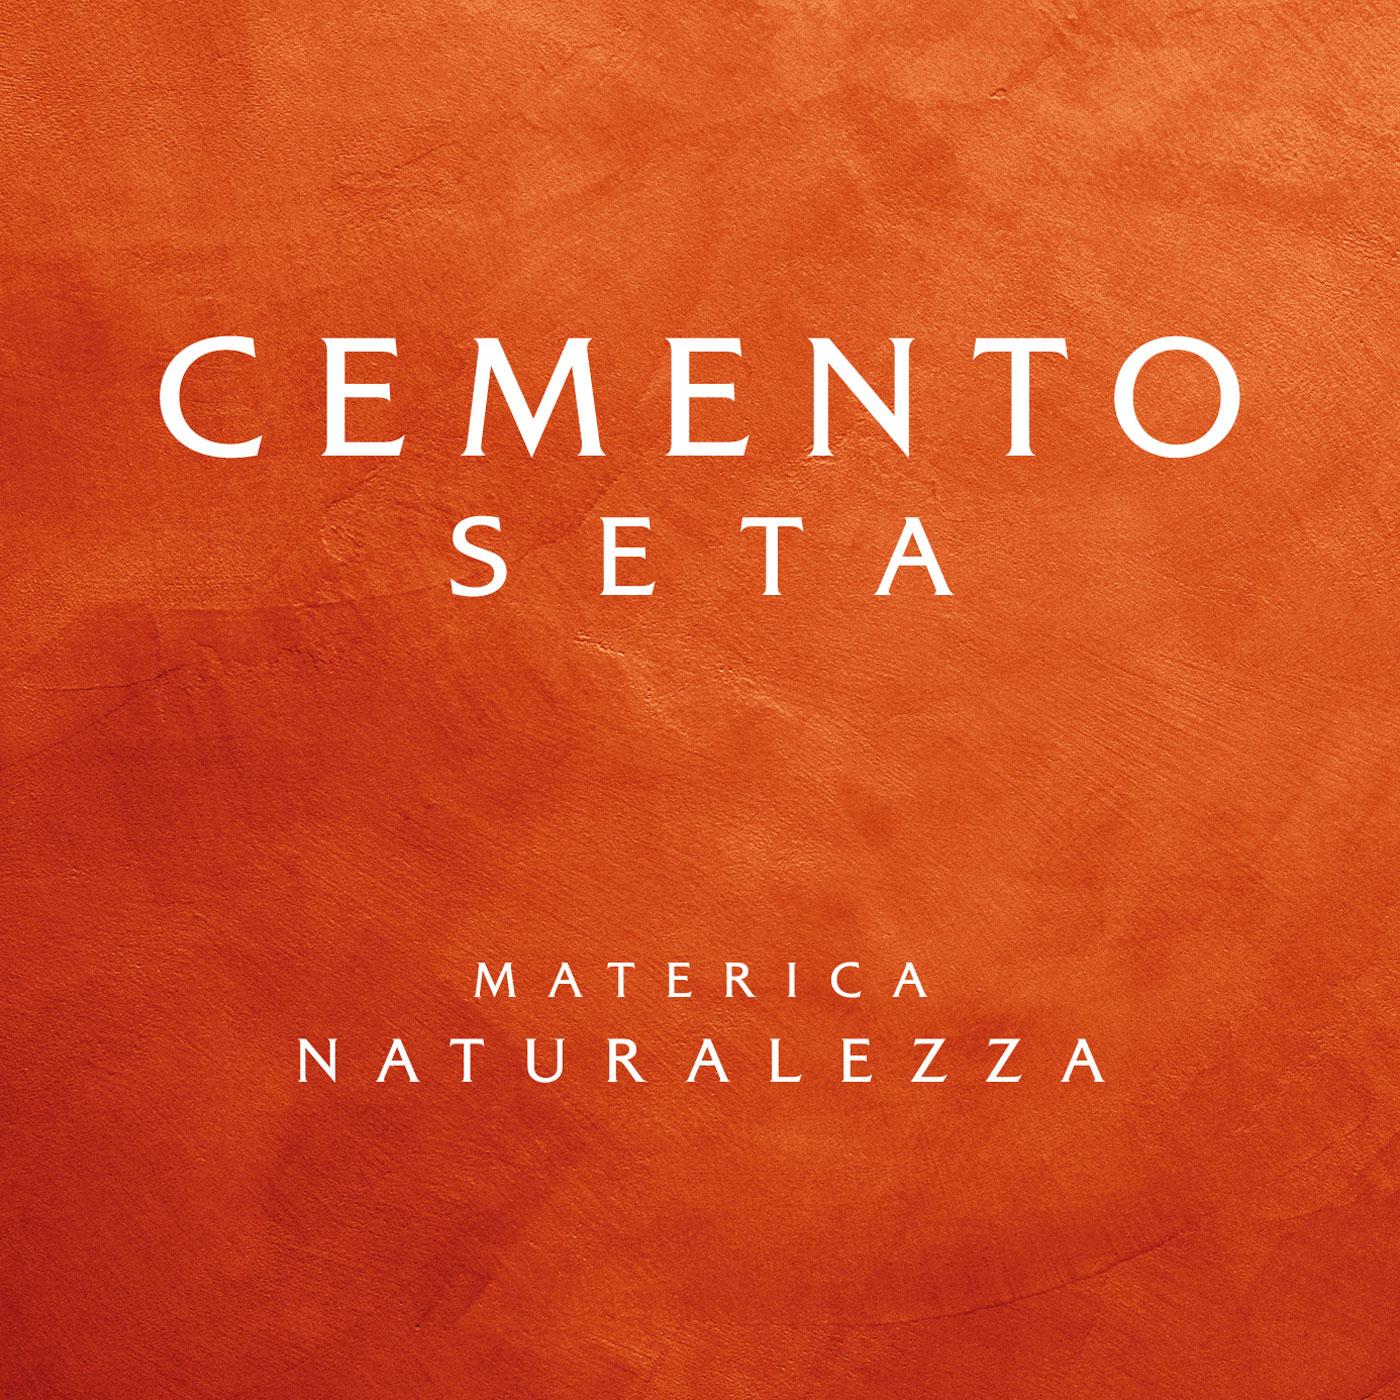 errelab-cemento-seta-r2